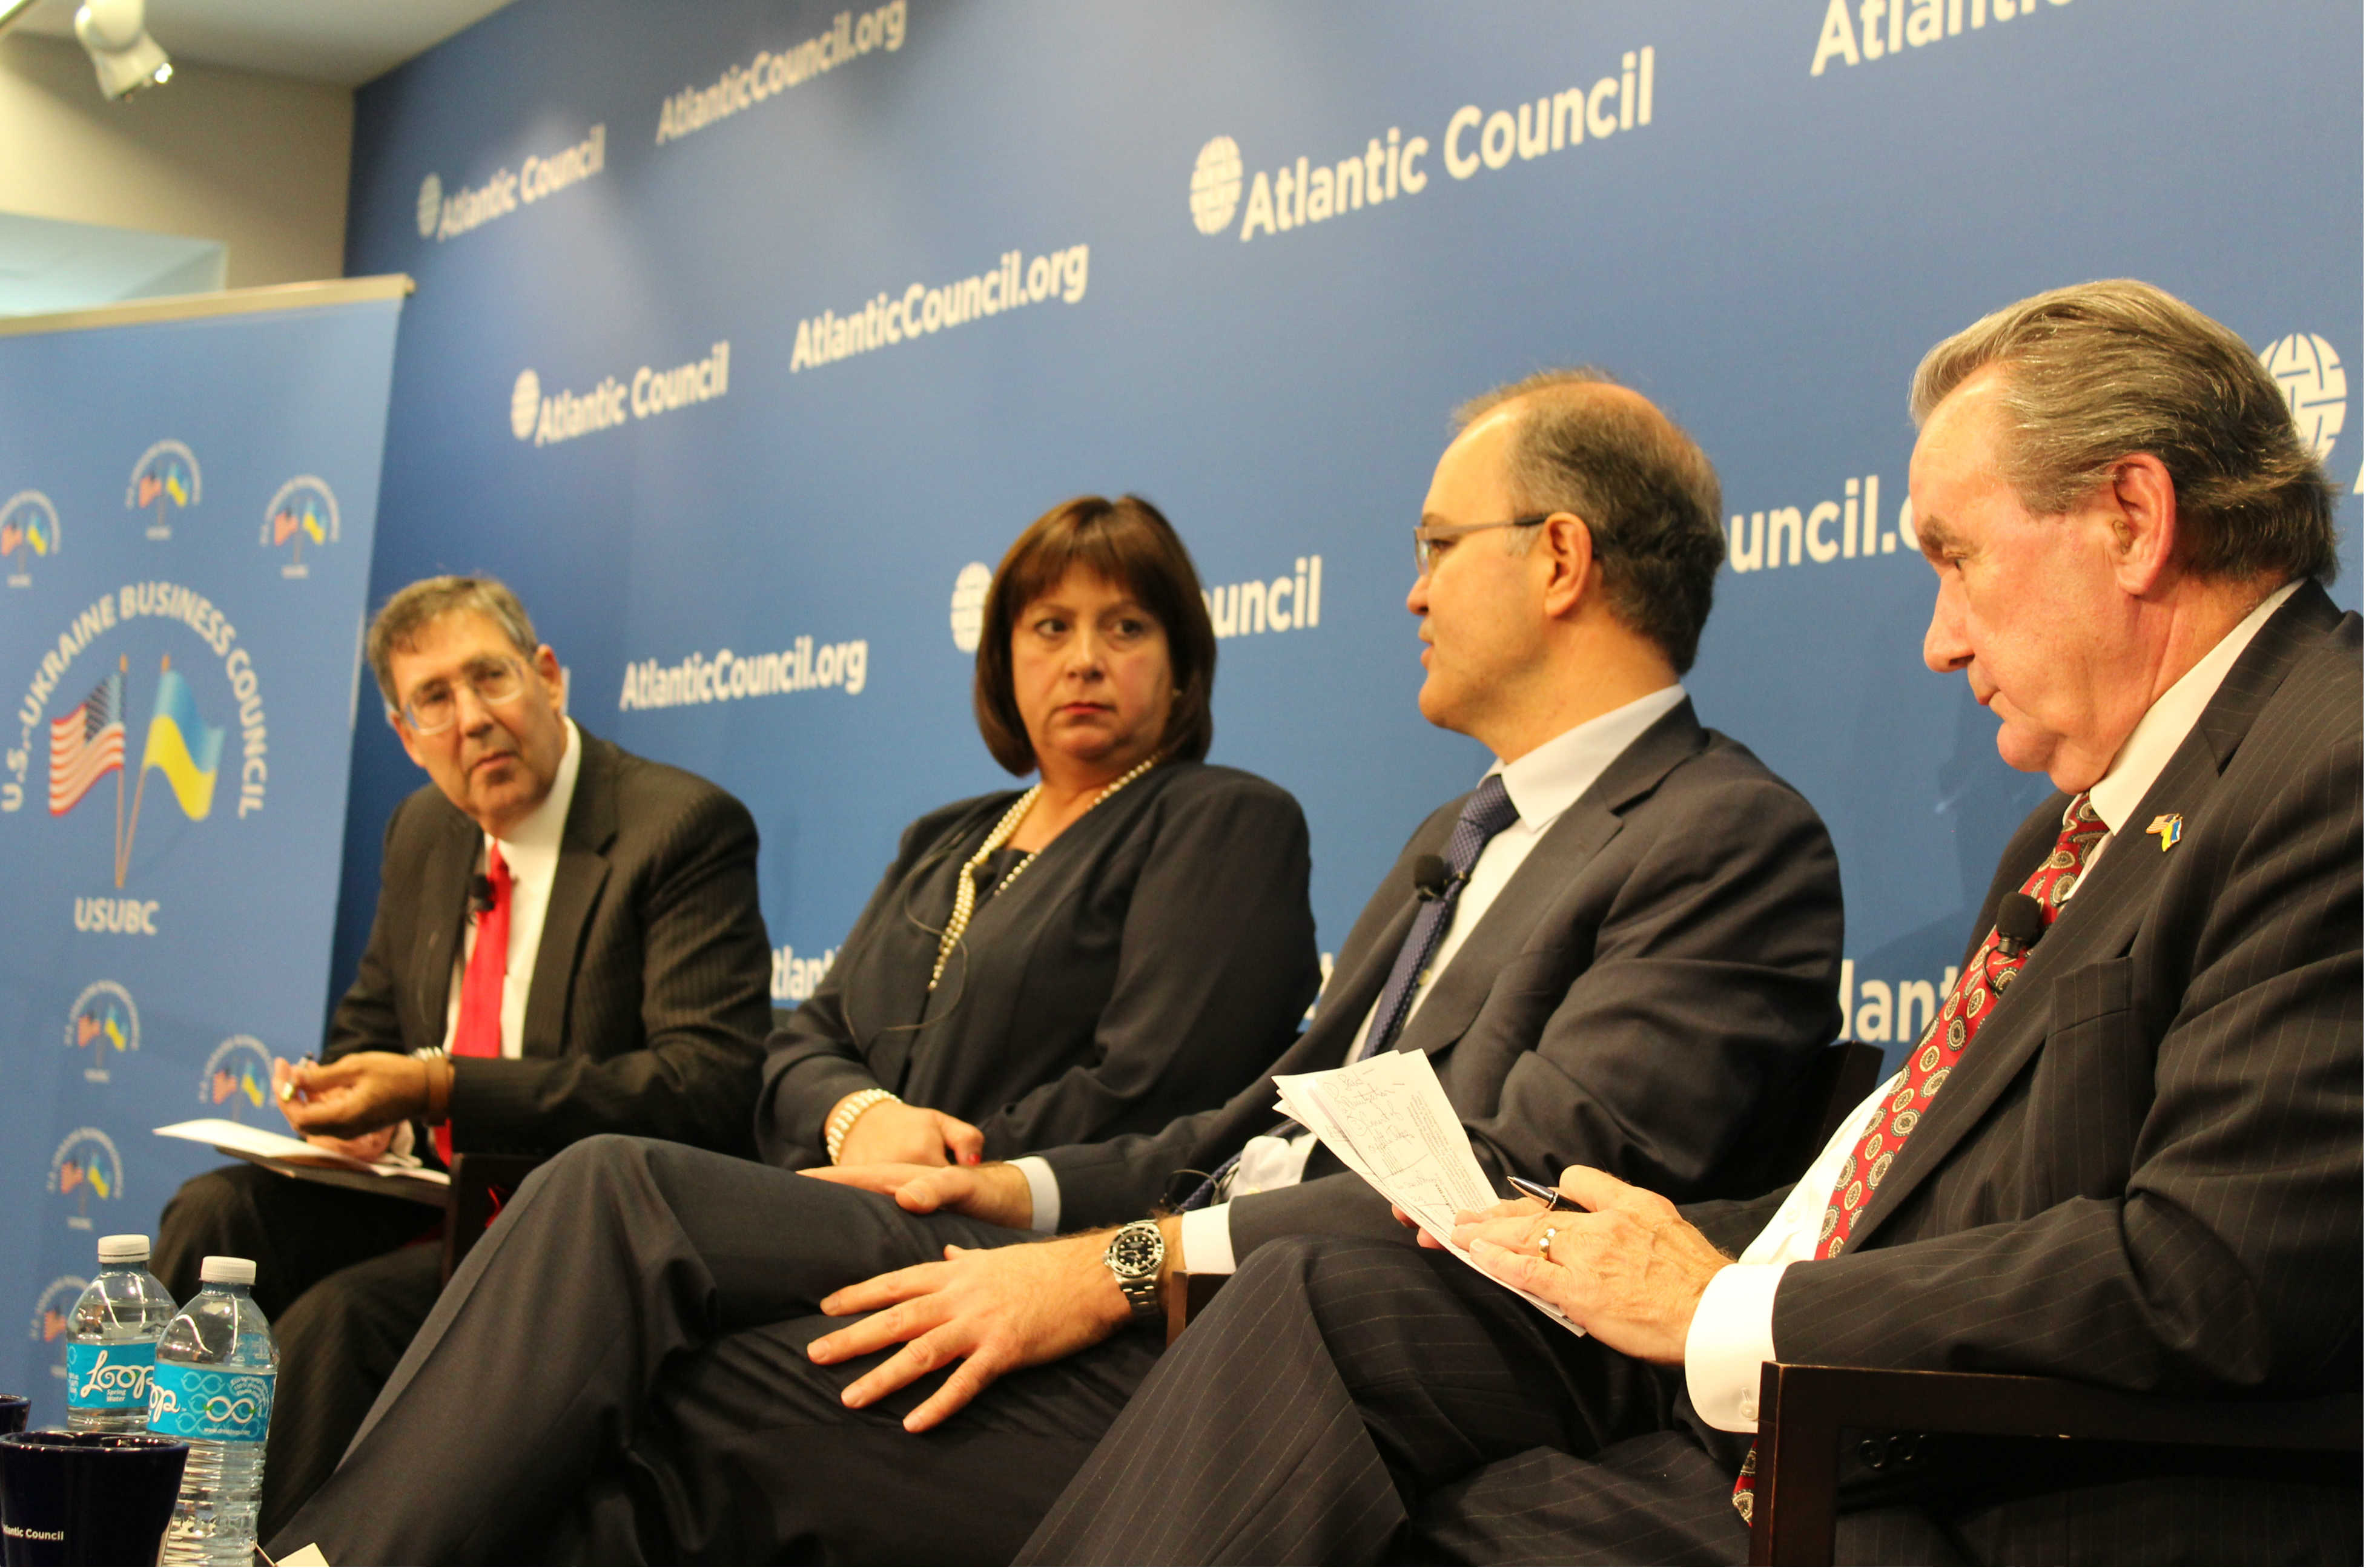 Natalie Jaresko Says $25 Billion More Needed to Make Ukraine's Reforms Irreversible